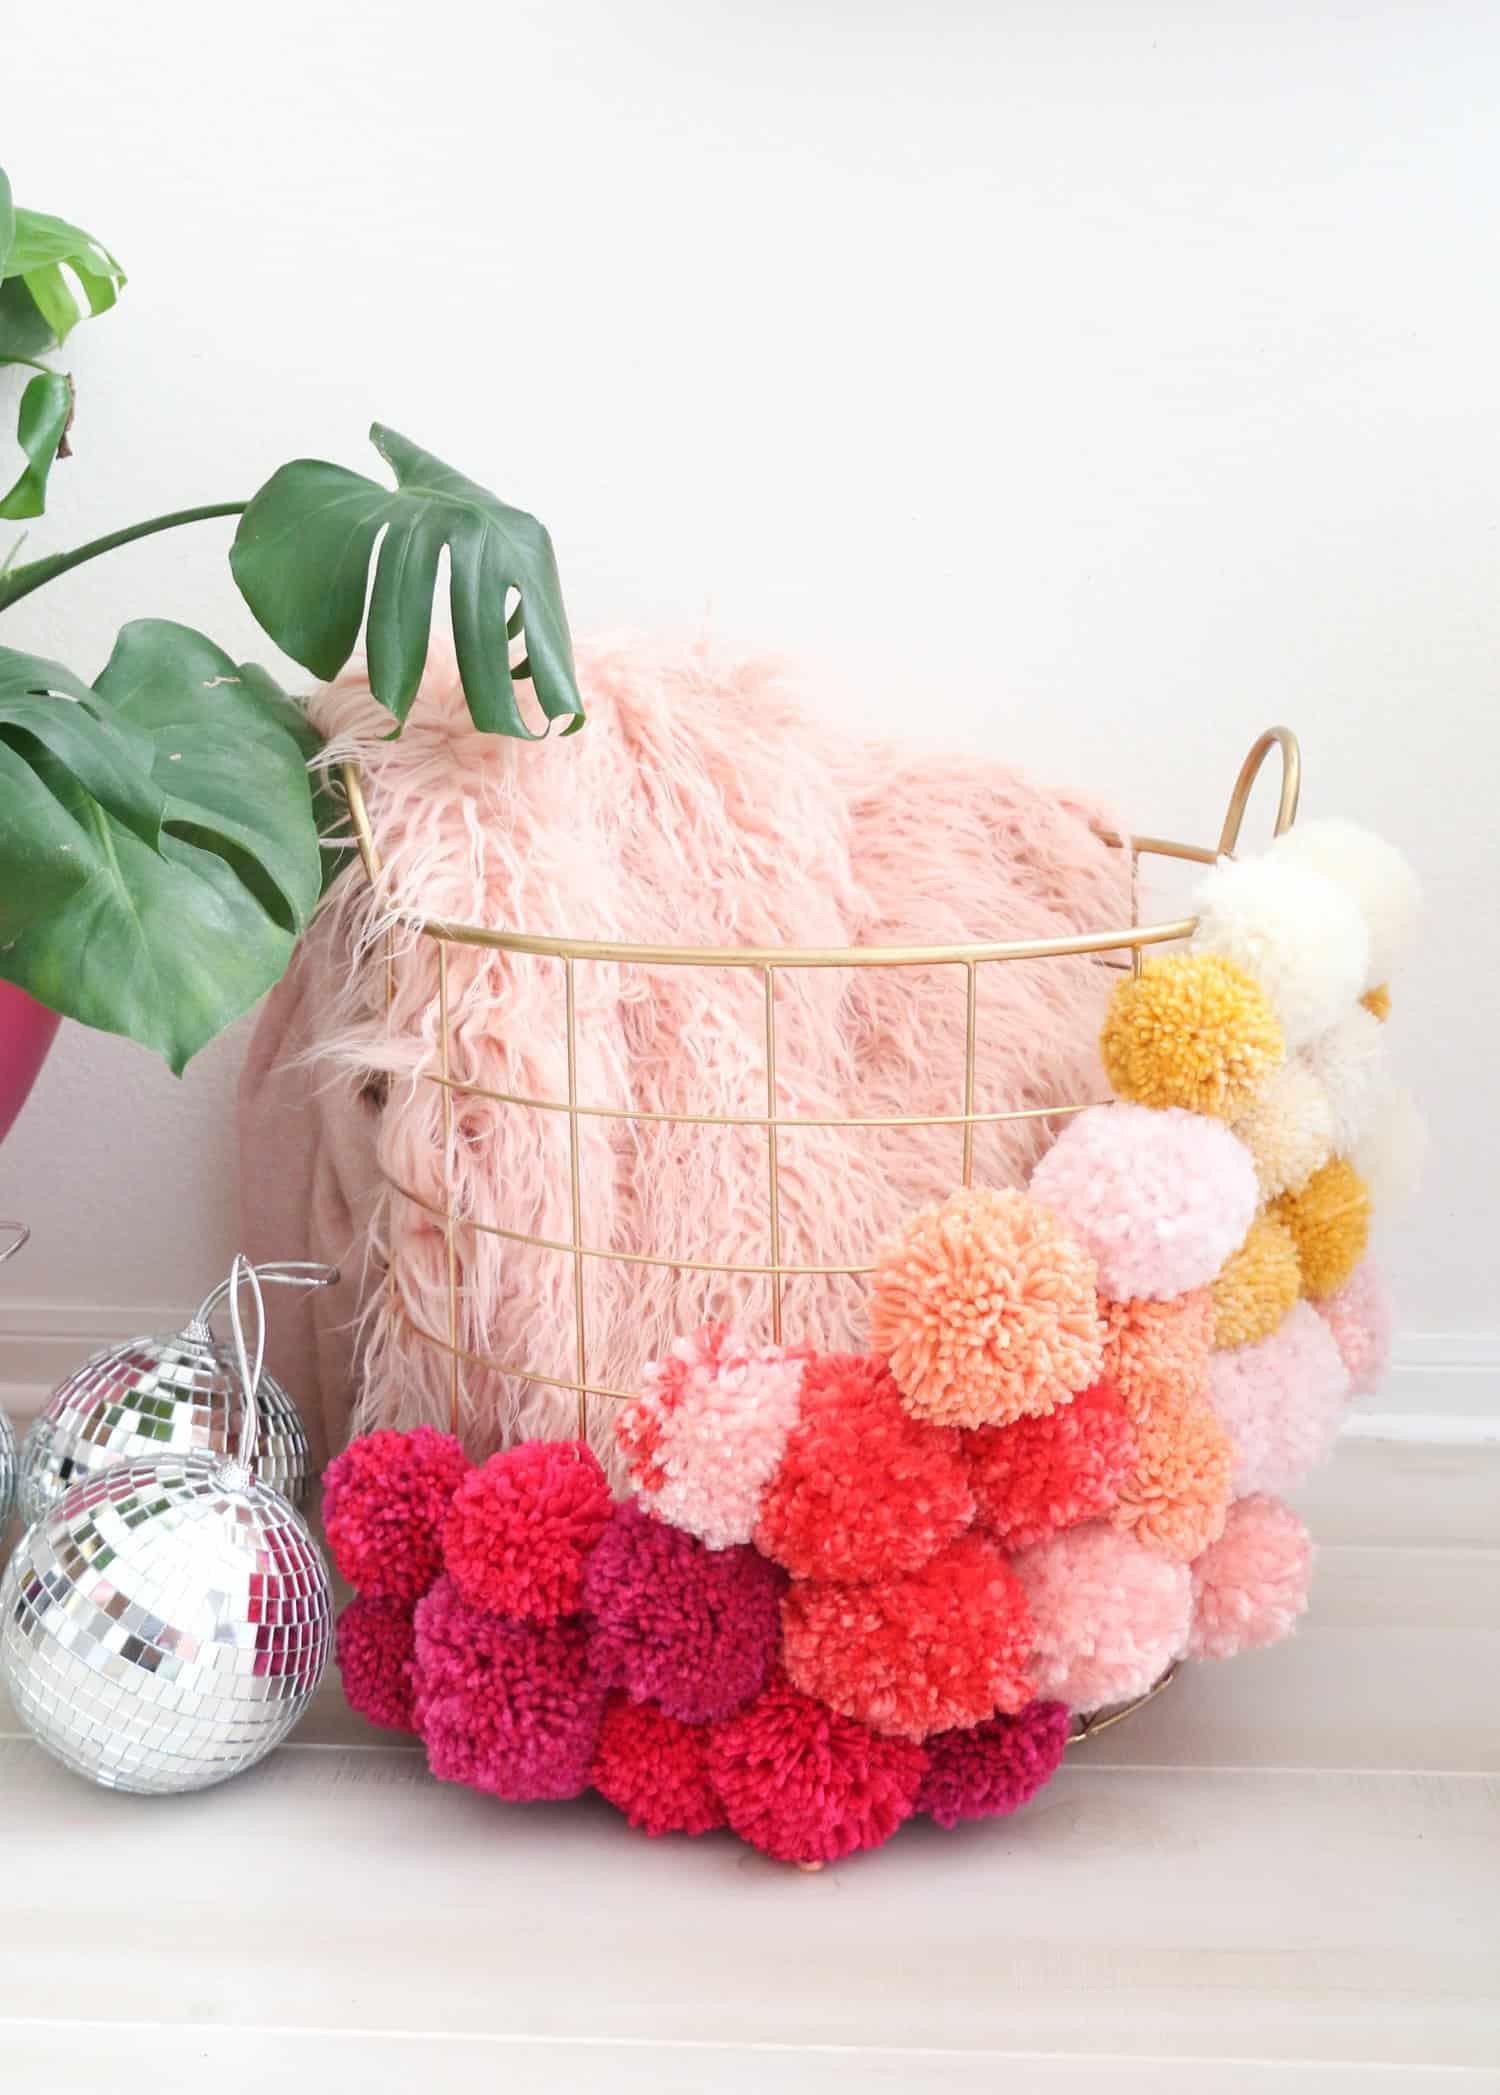 Make your own pom pom basket